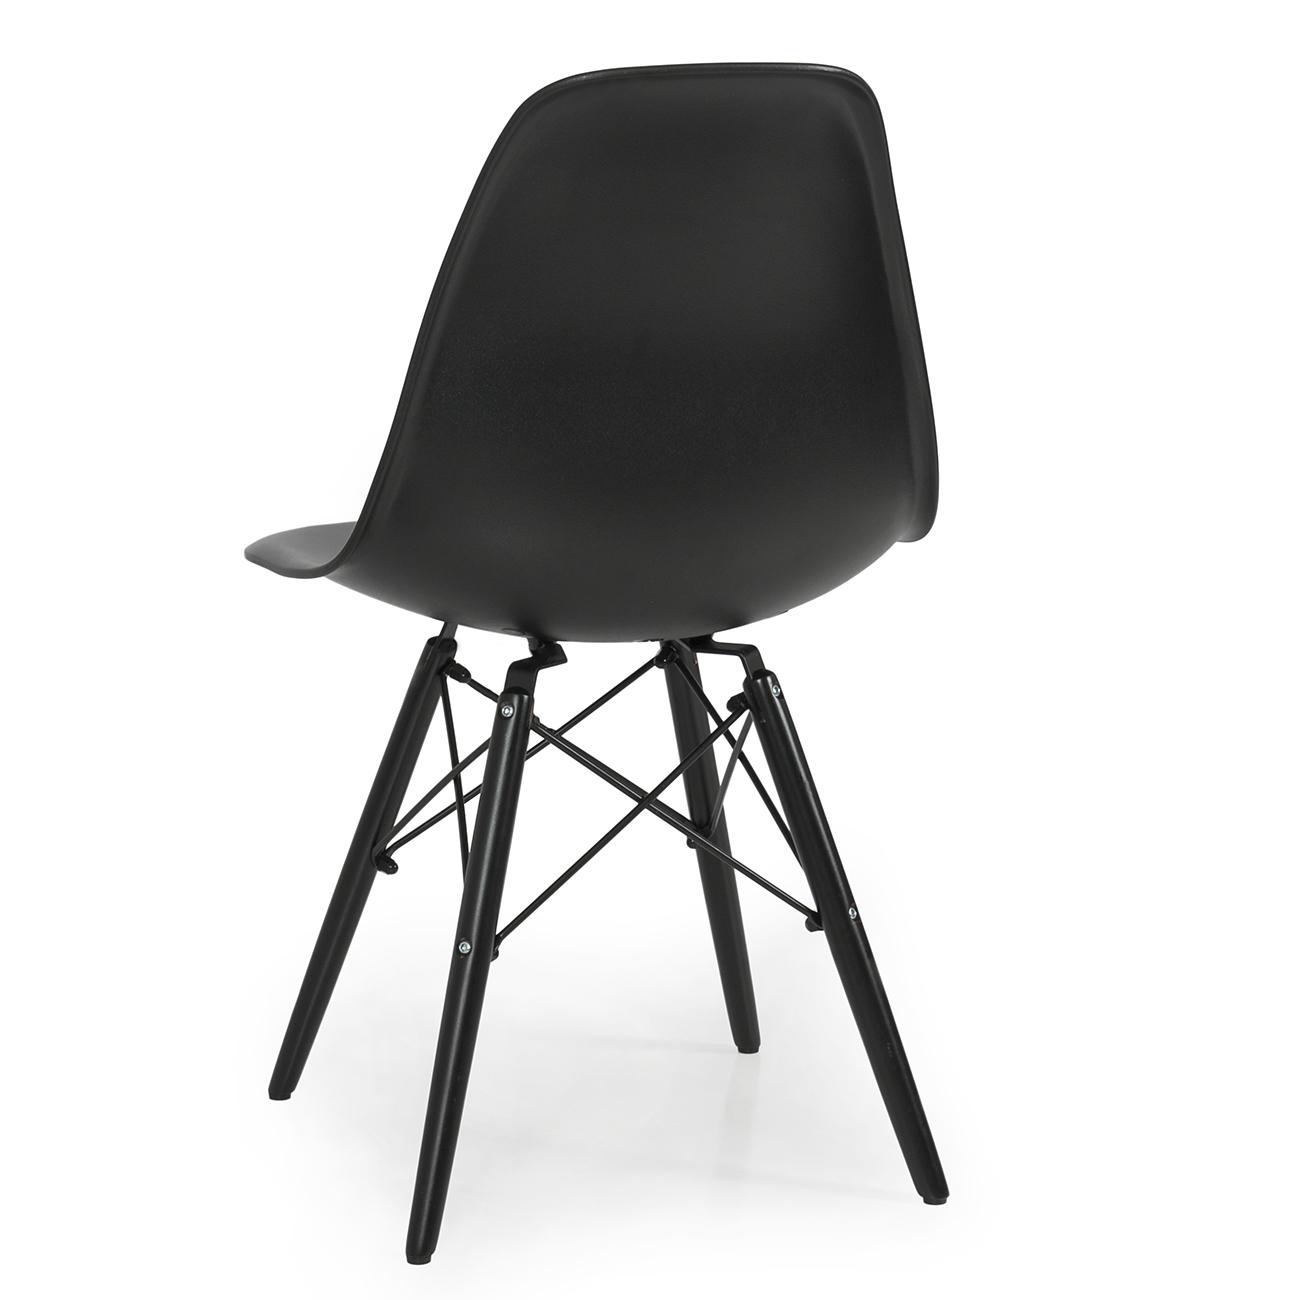 set of 4 mid century modern eames style dsw dining side chair wood leg black ebay. Black Bedroom Furniture Sets. Home Design Ideas